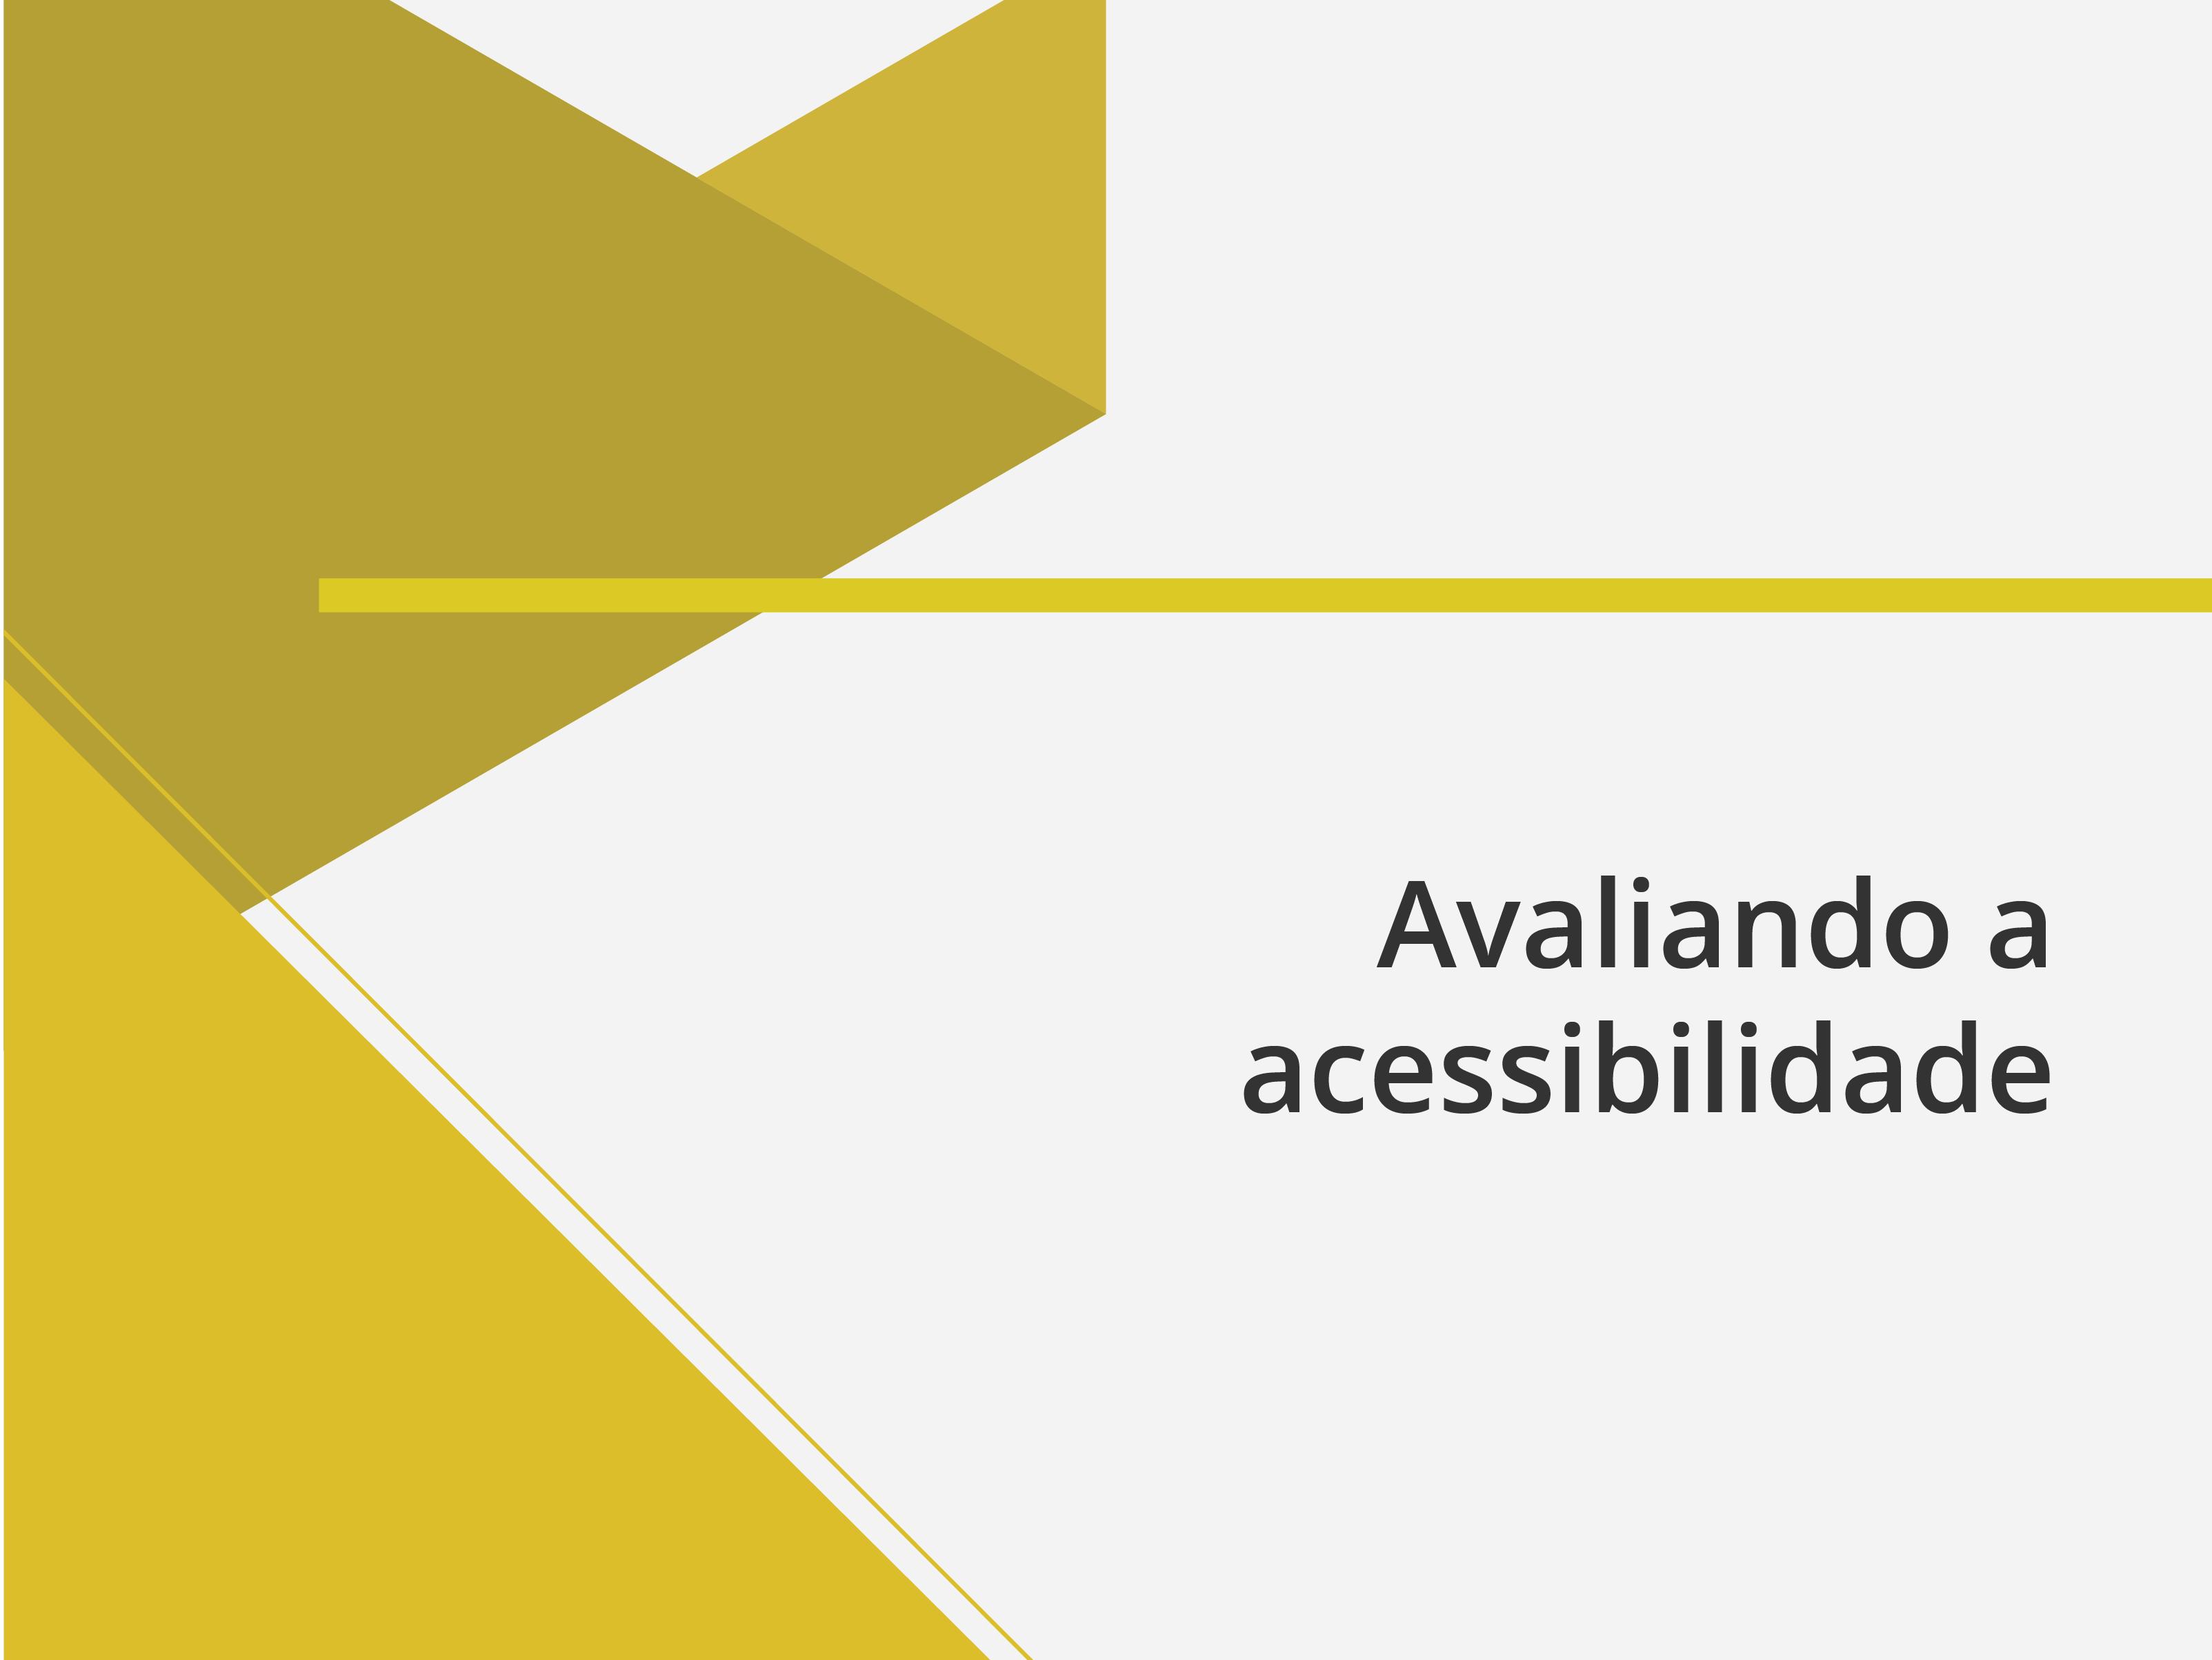 Banner avaliando a acessibilidade